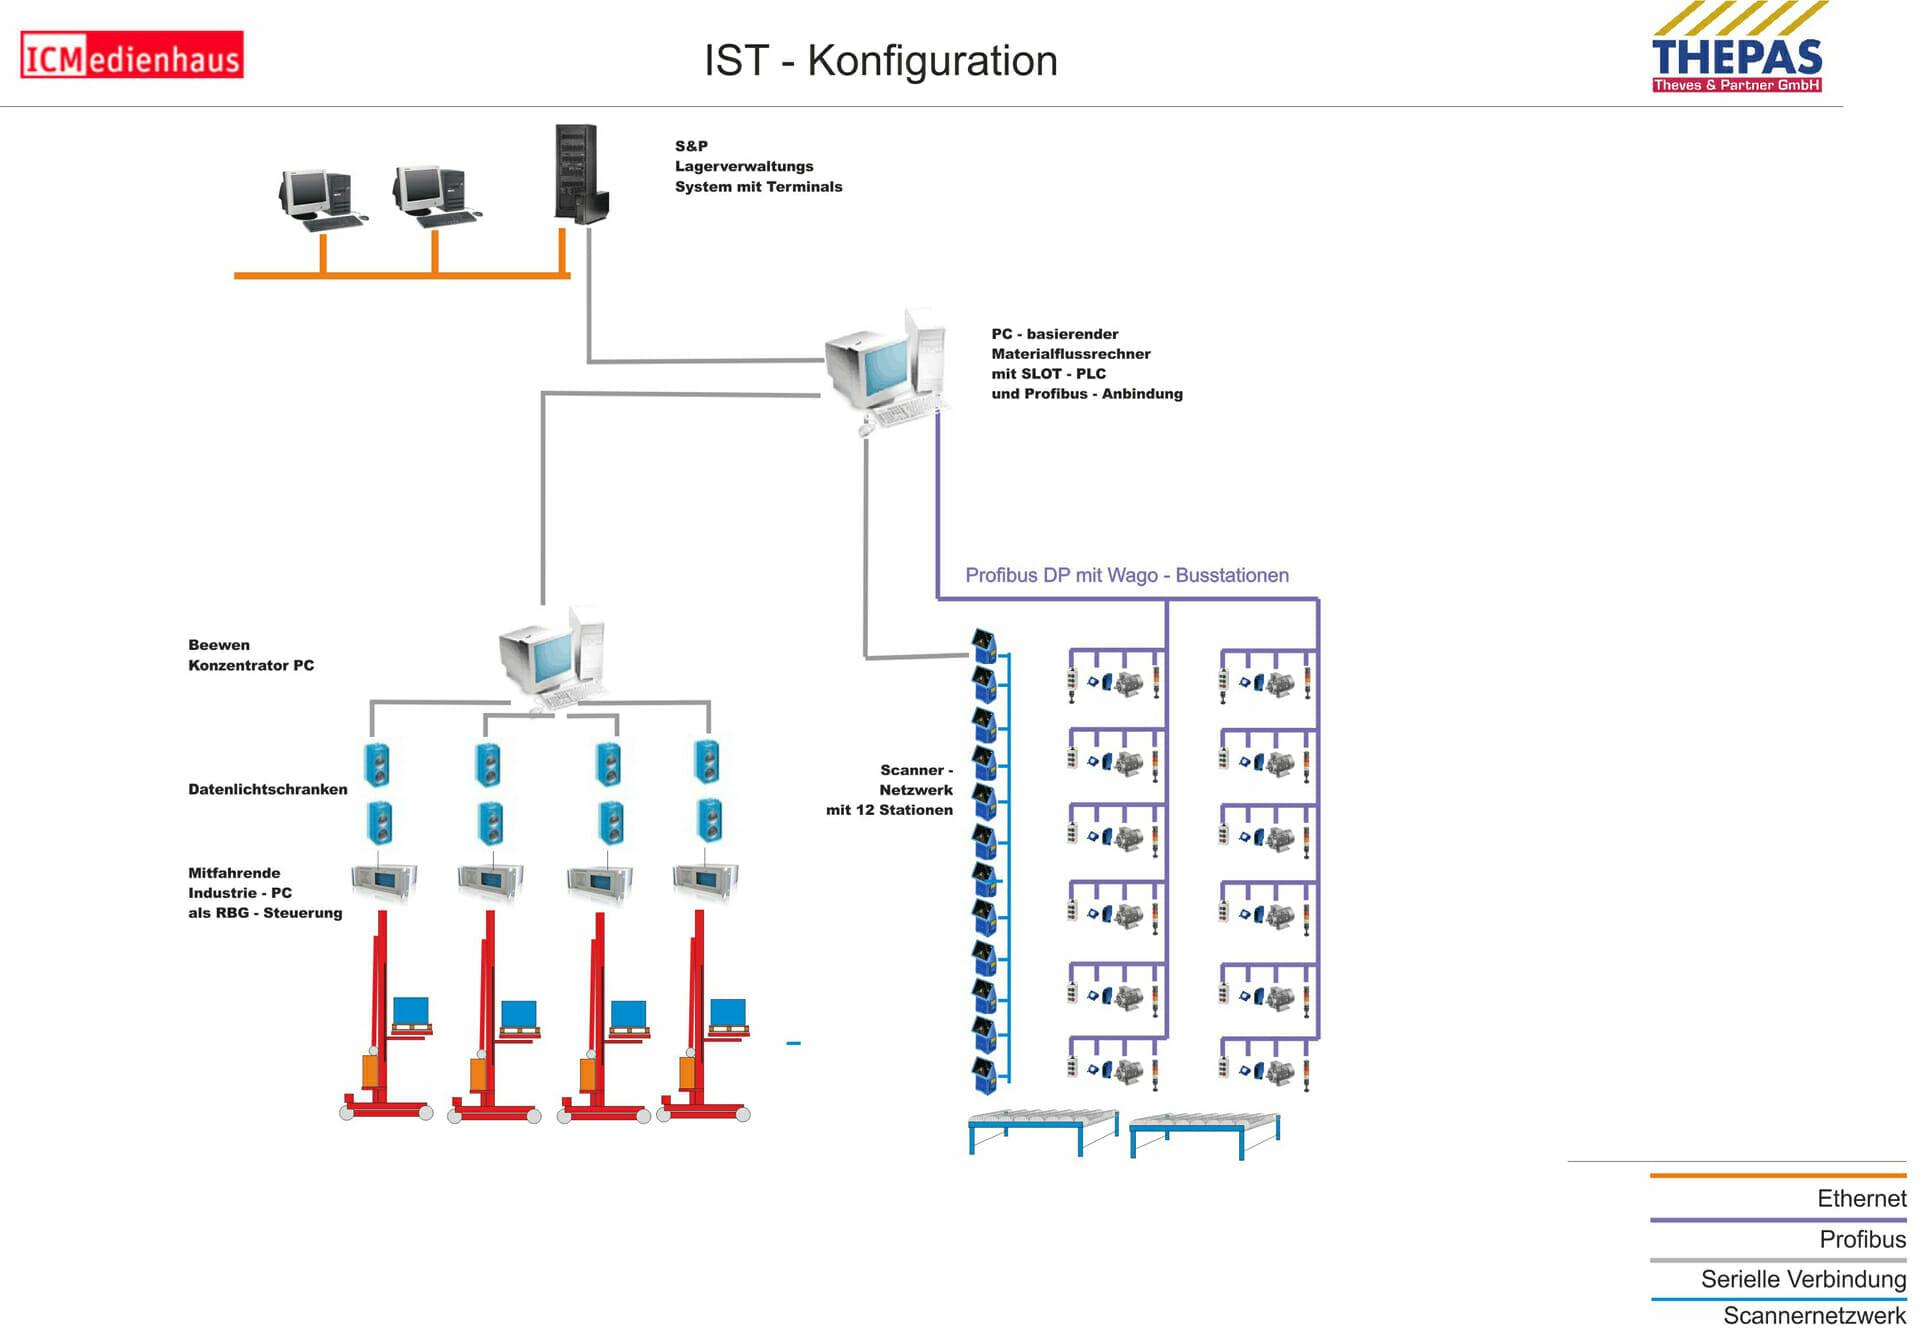 Altsystem / IST-Konfiguration